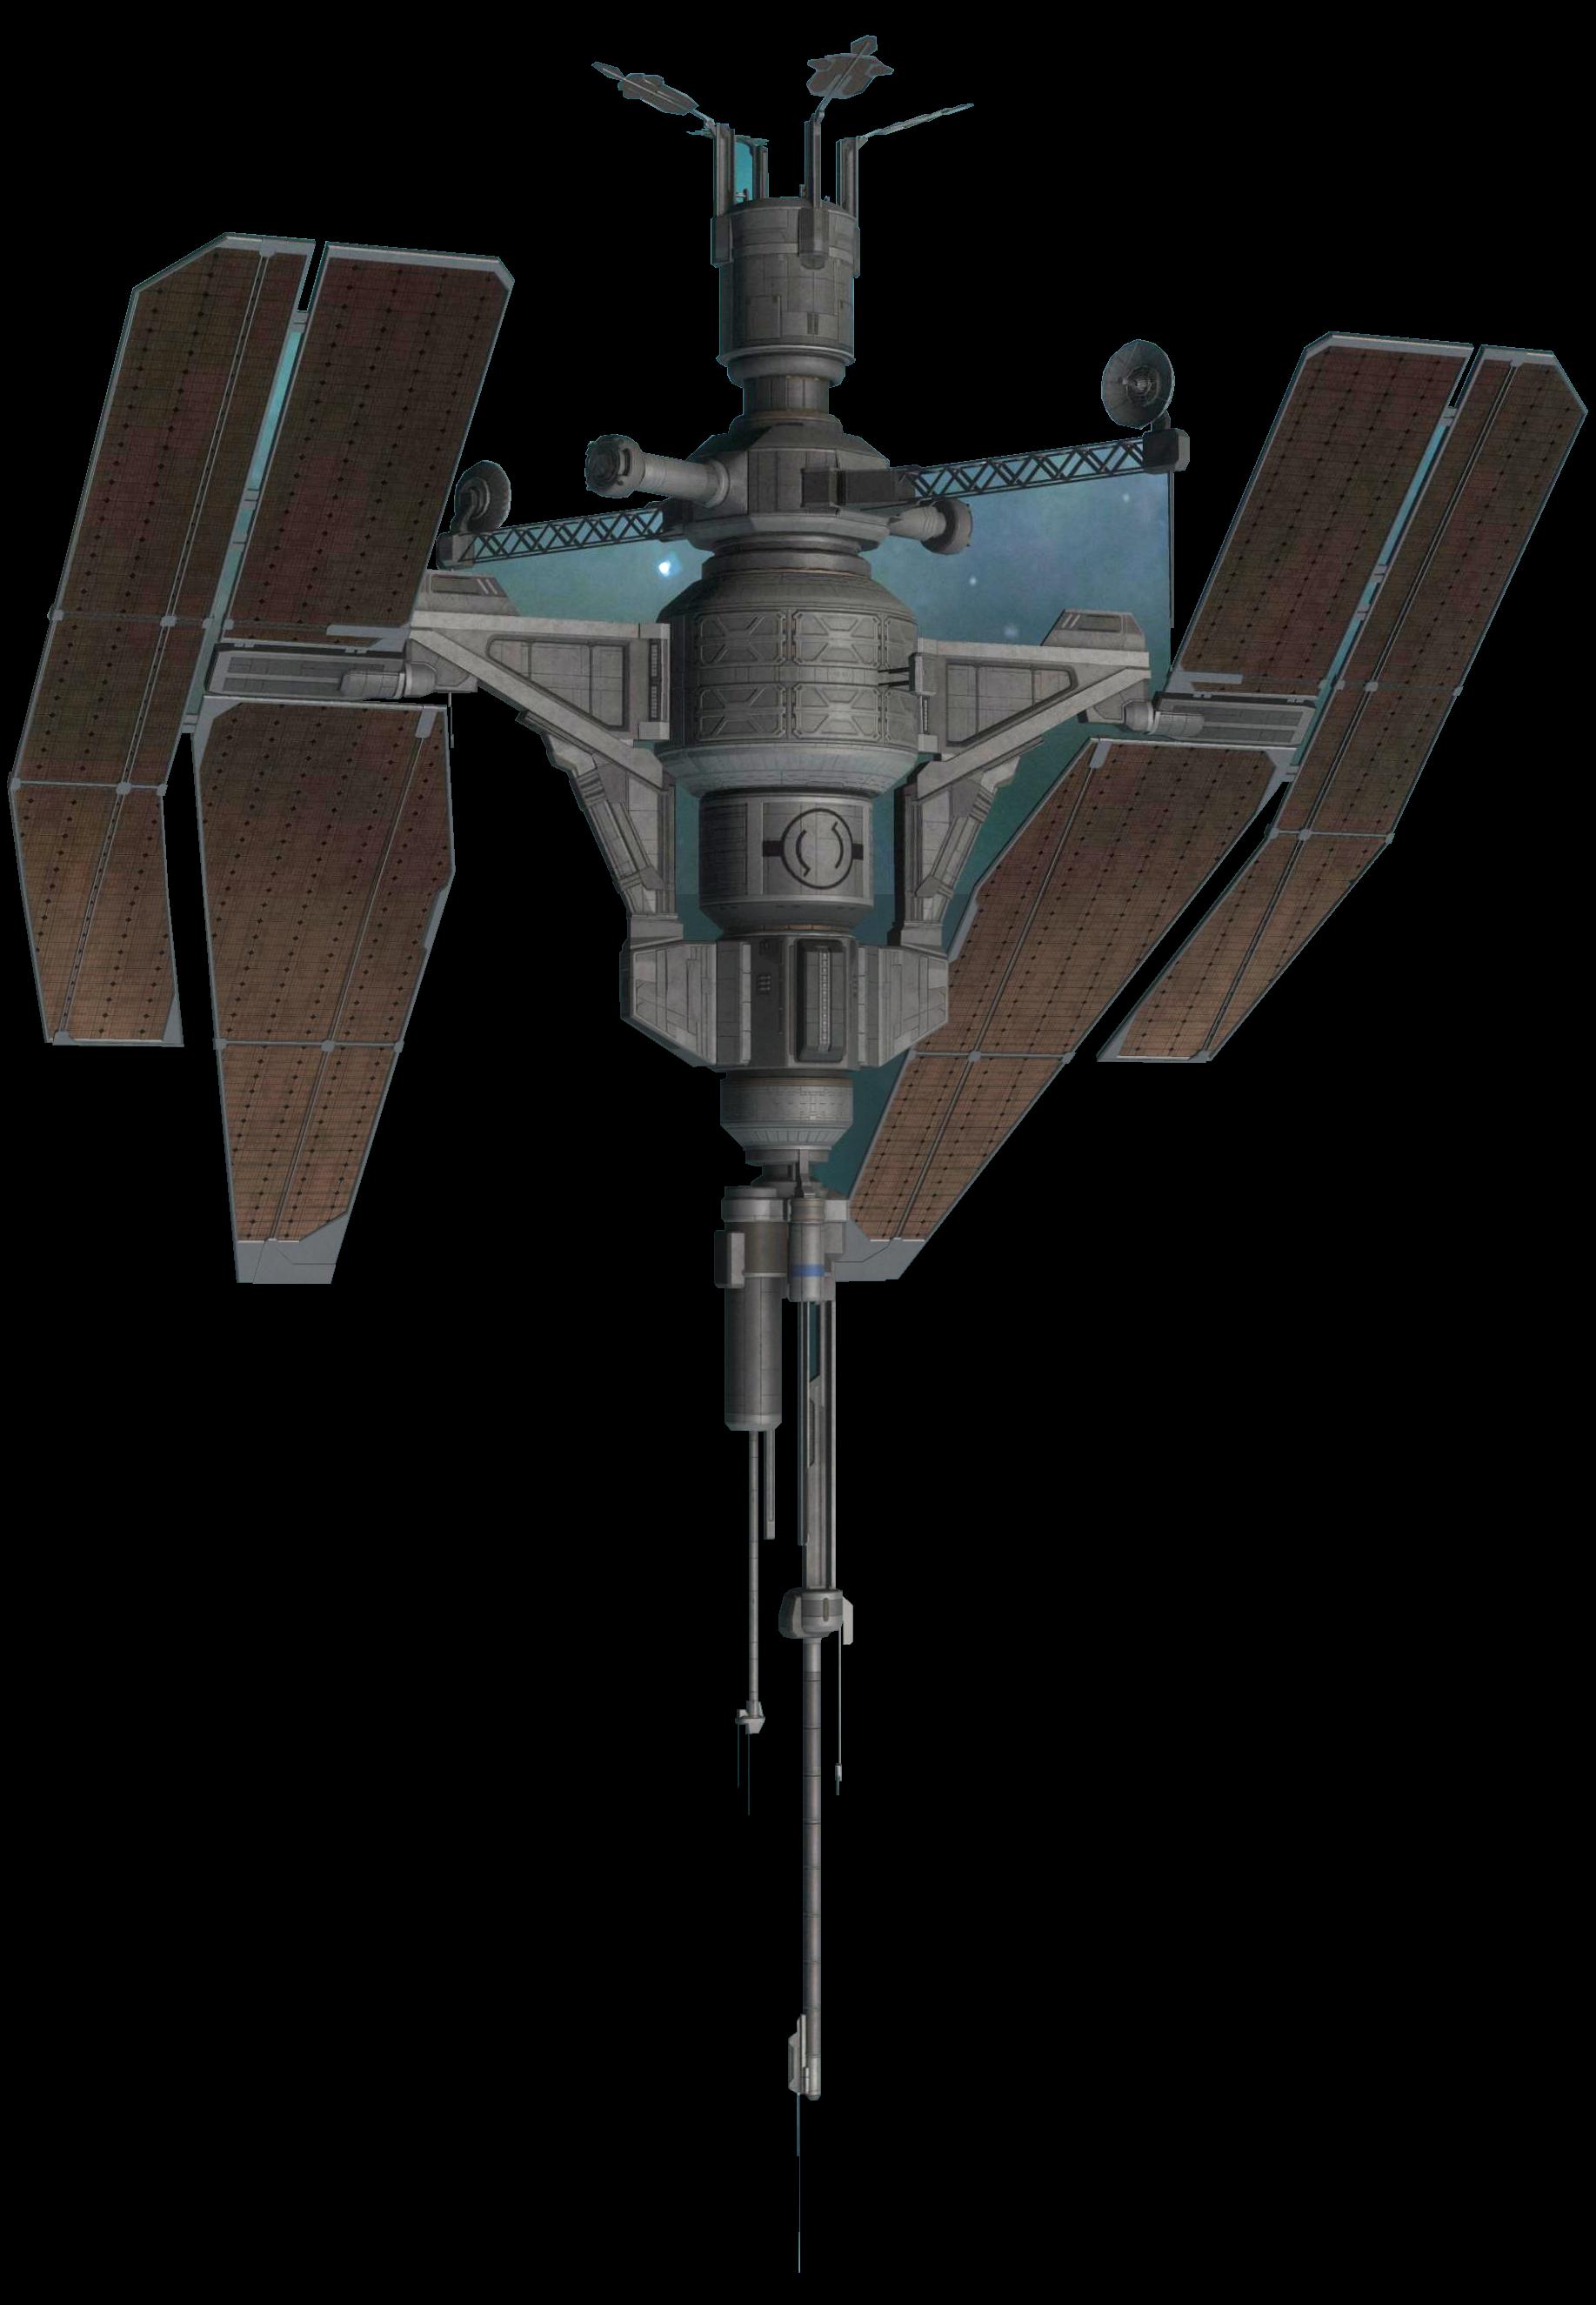 Baliza RA-15